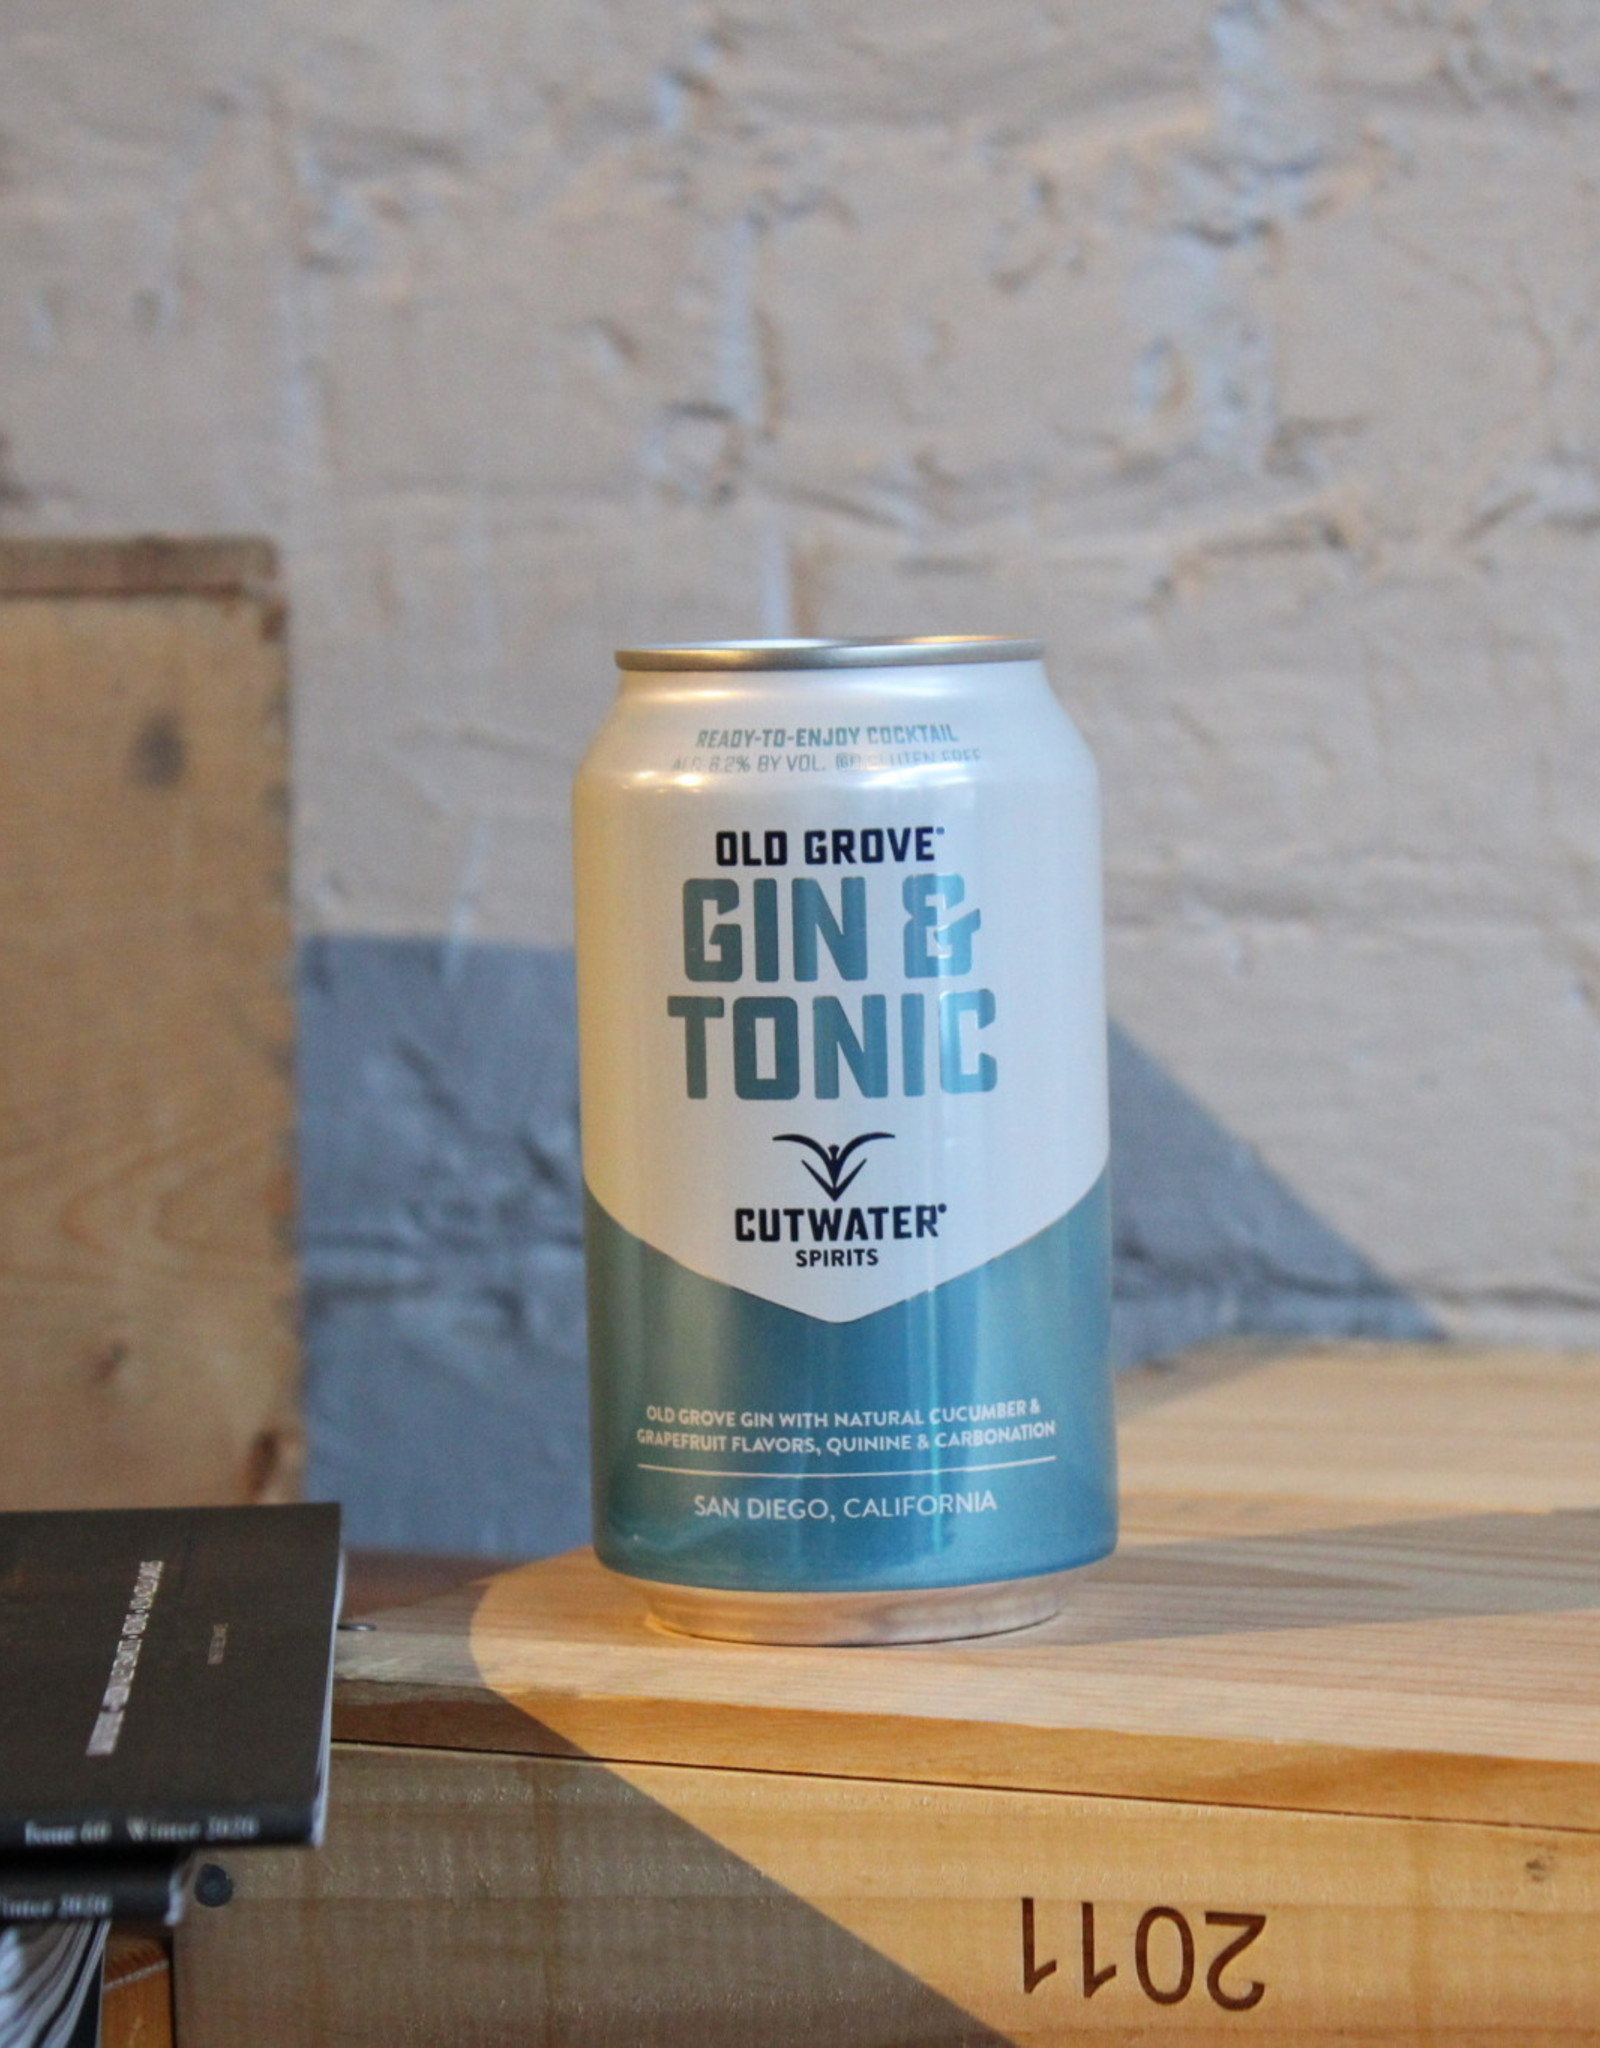 Cutwater Gin & Tonic - CA (12oz can)